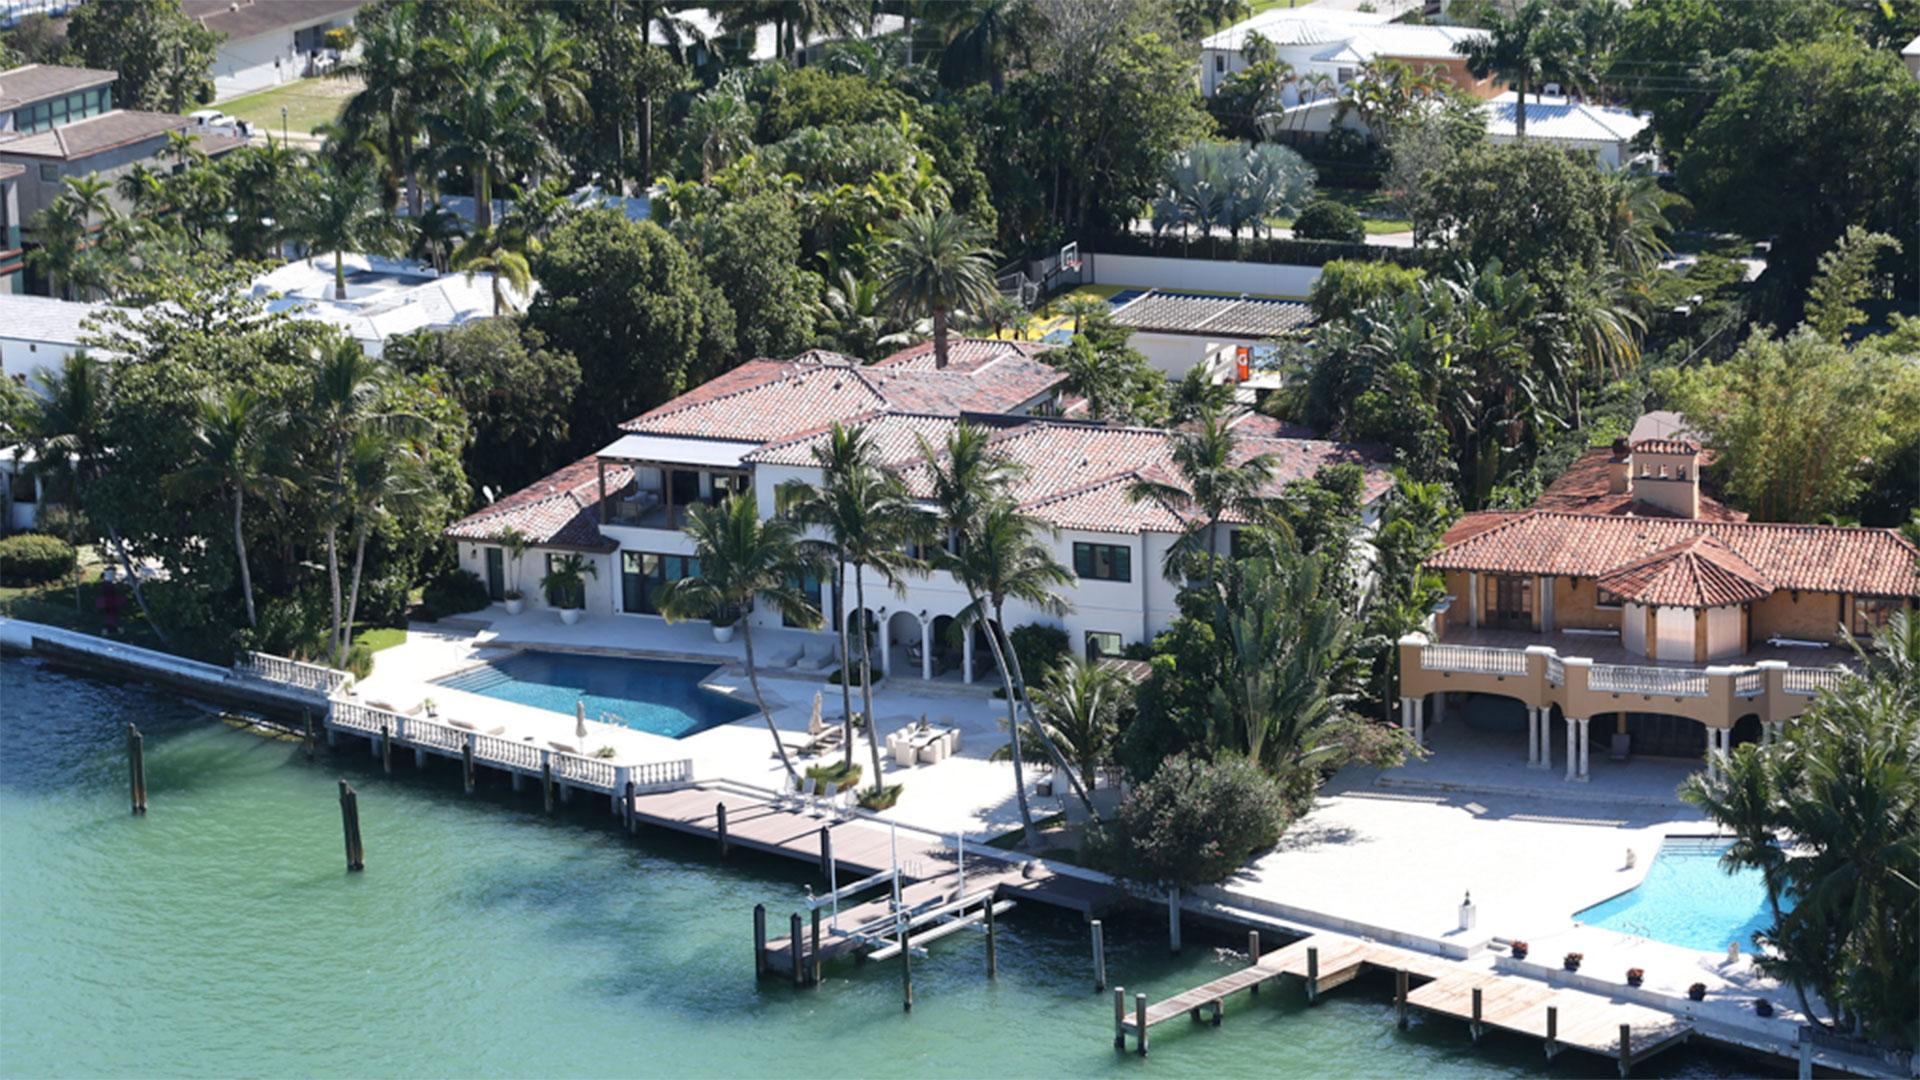 La propiedad de Shakira en Miami